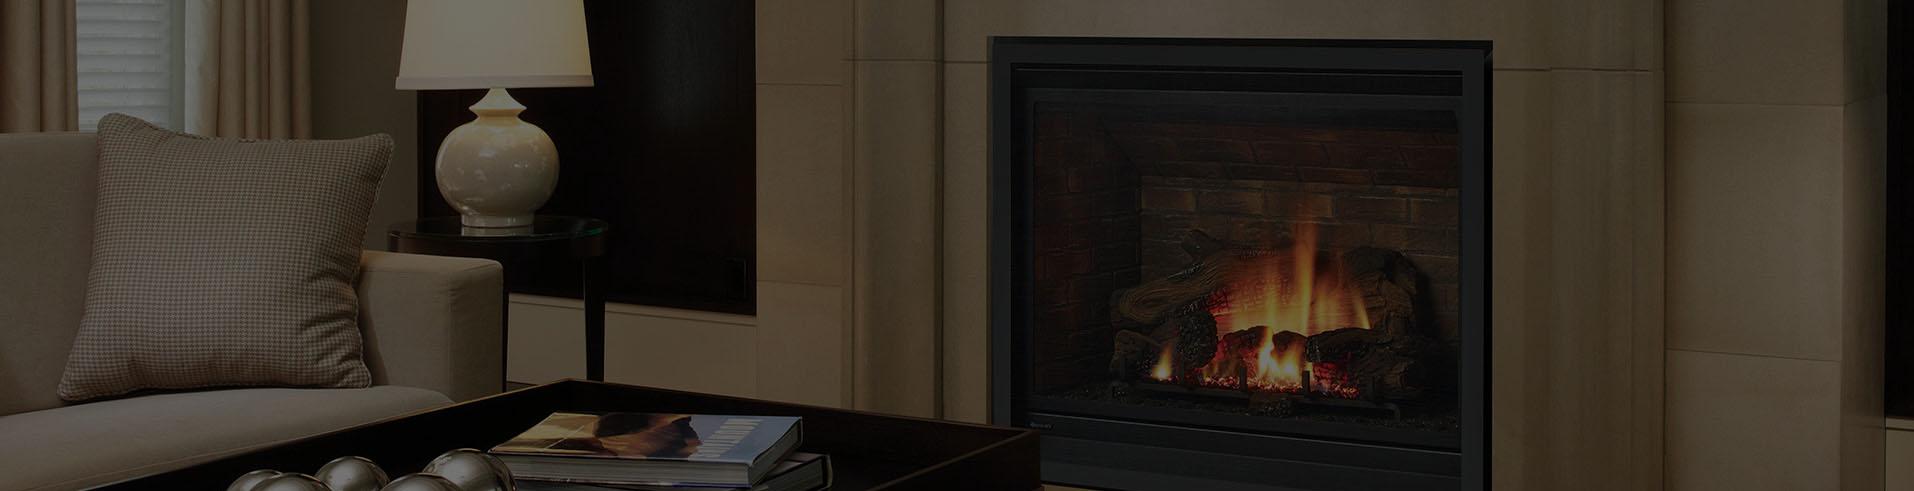 Above Photo of the Regency B41XTE Fireplace.